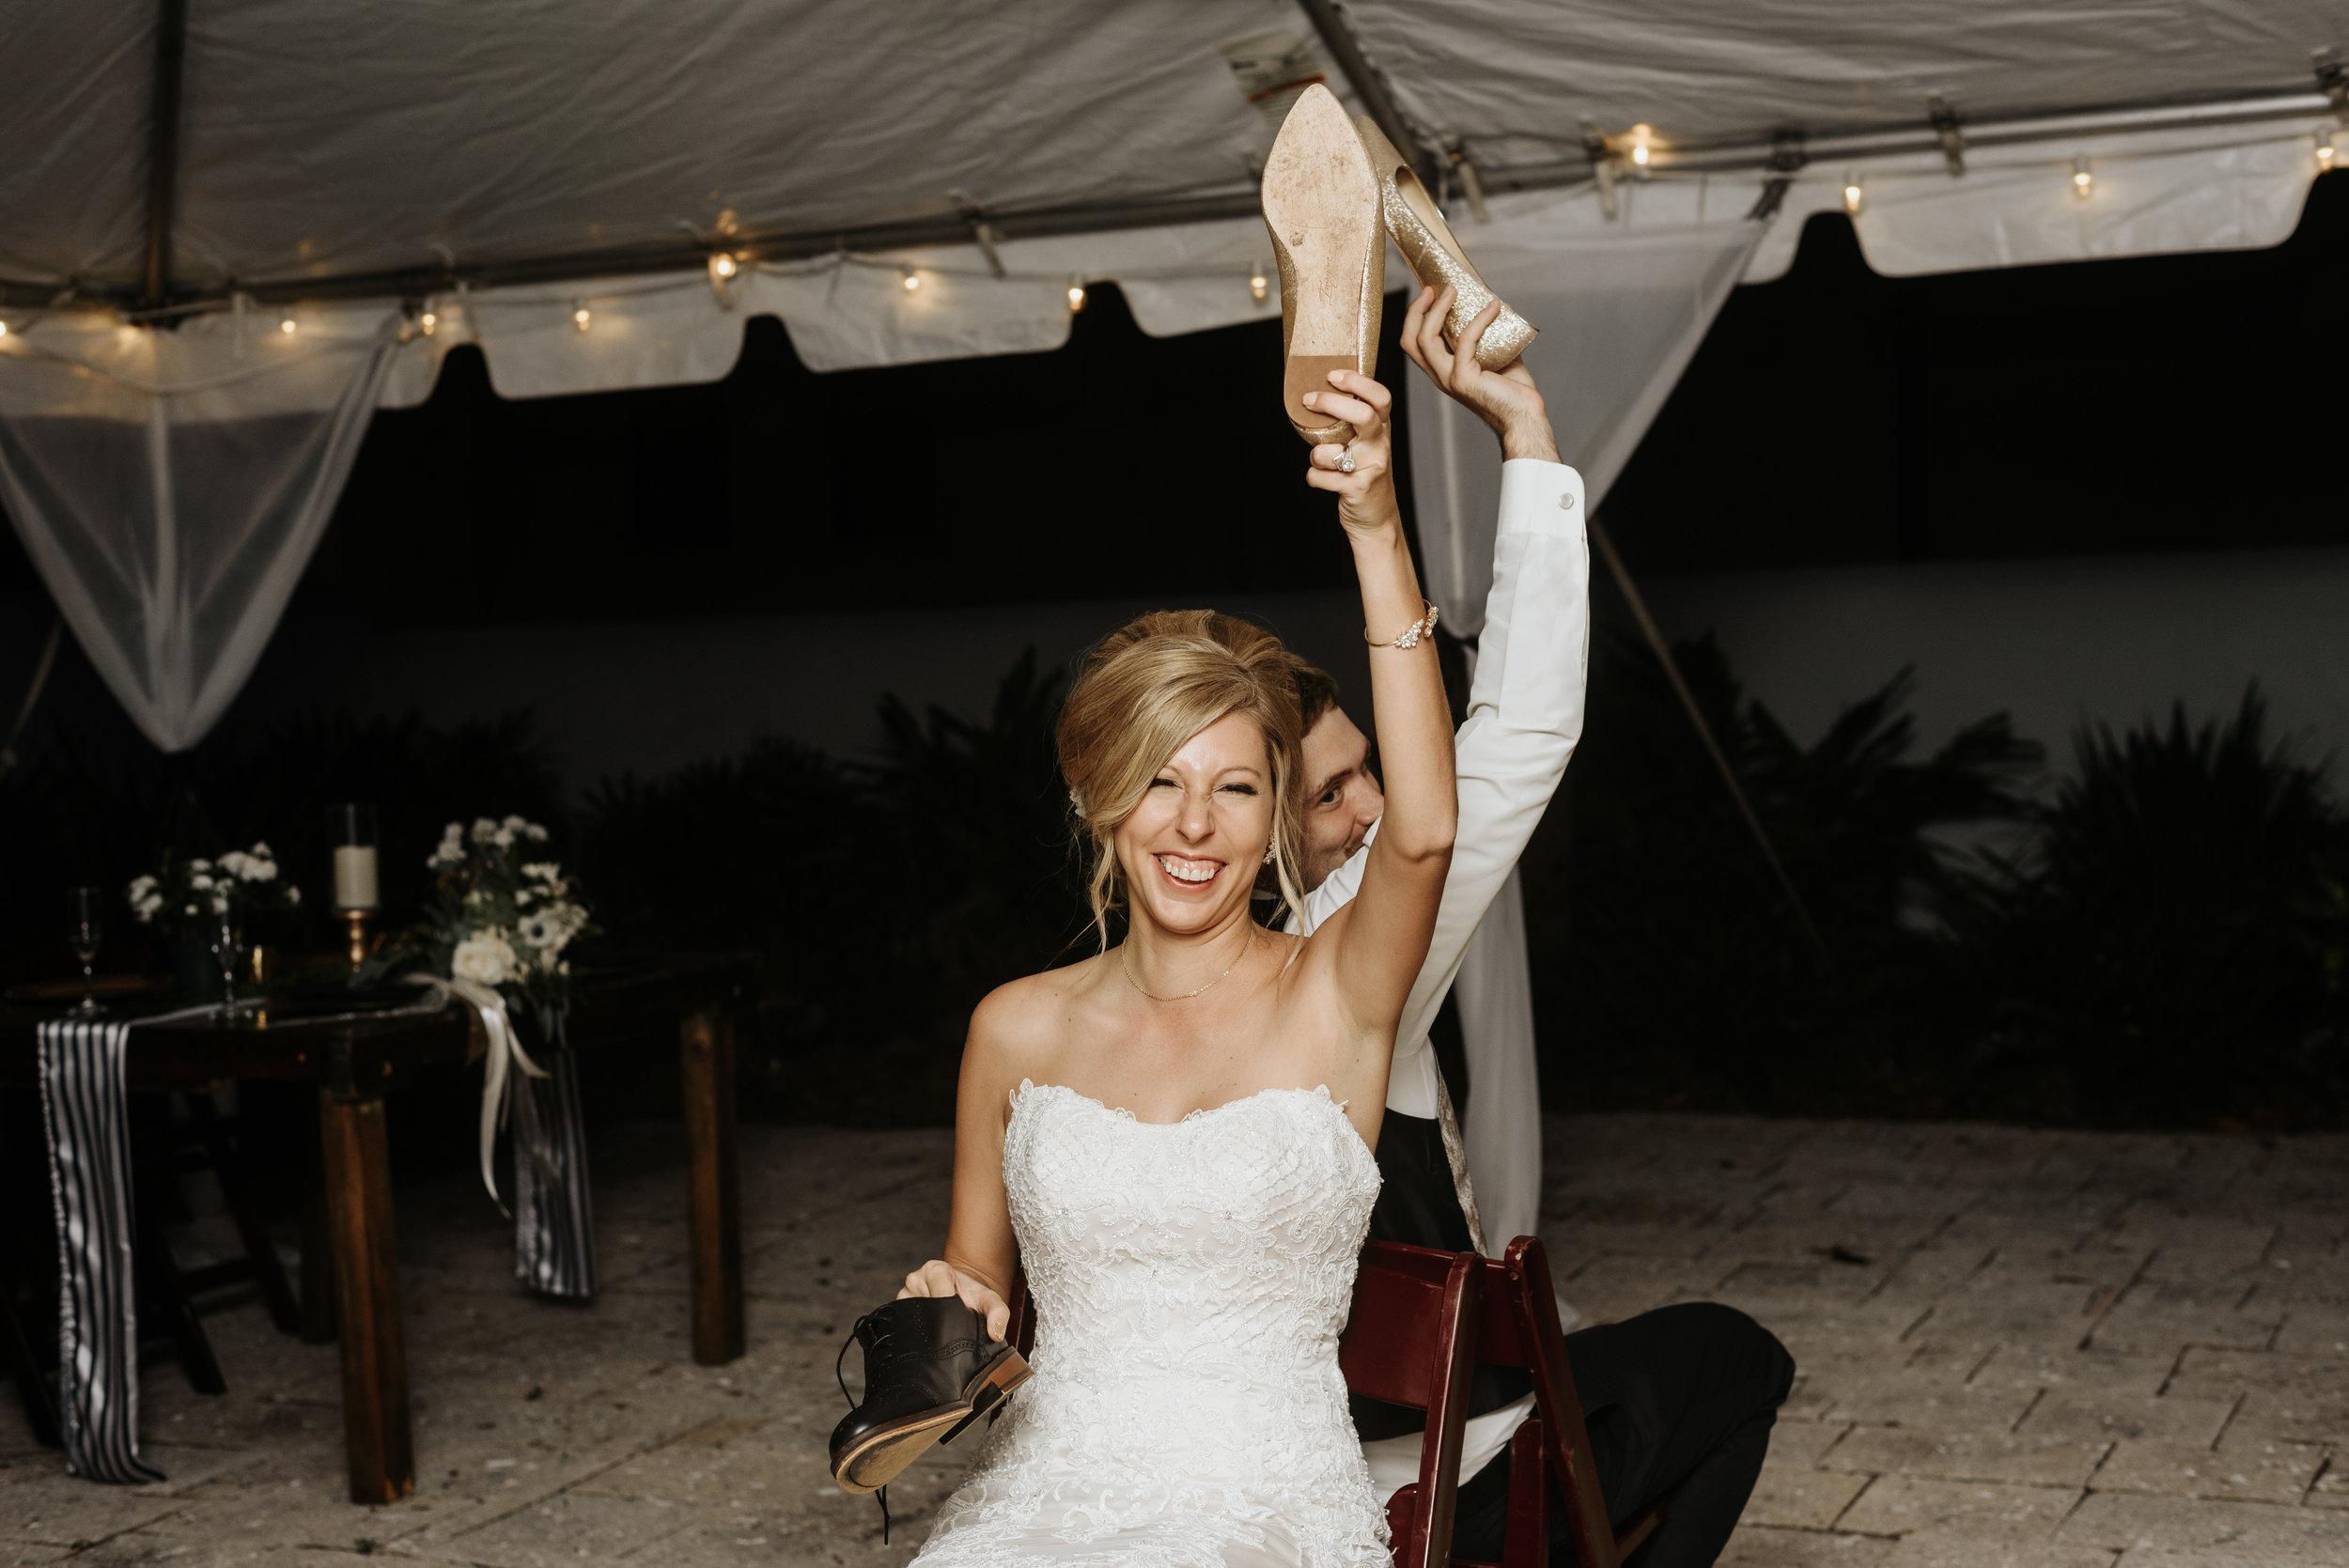 Mandy-Brad-Wedding-Previews-3334.jpg